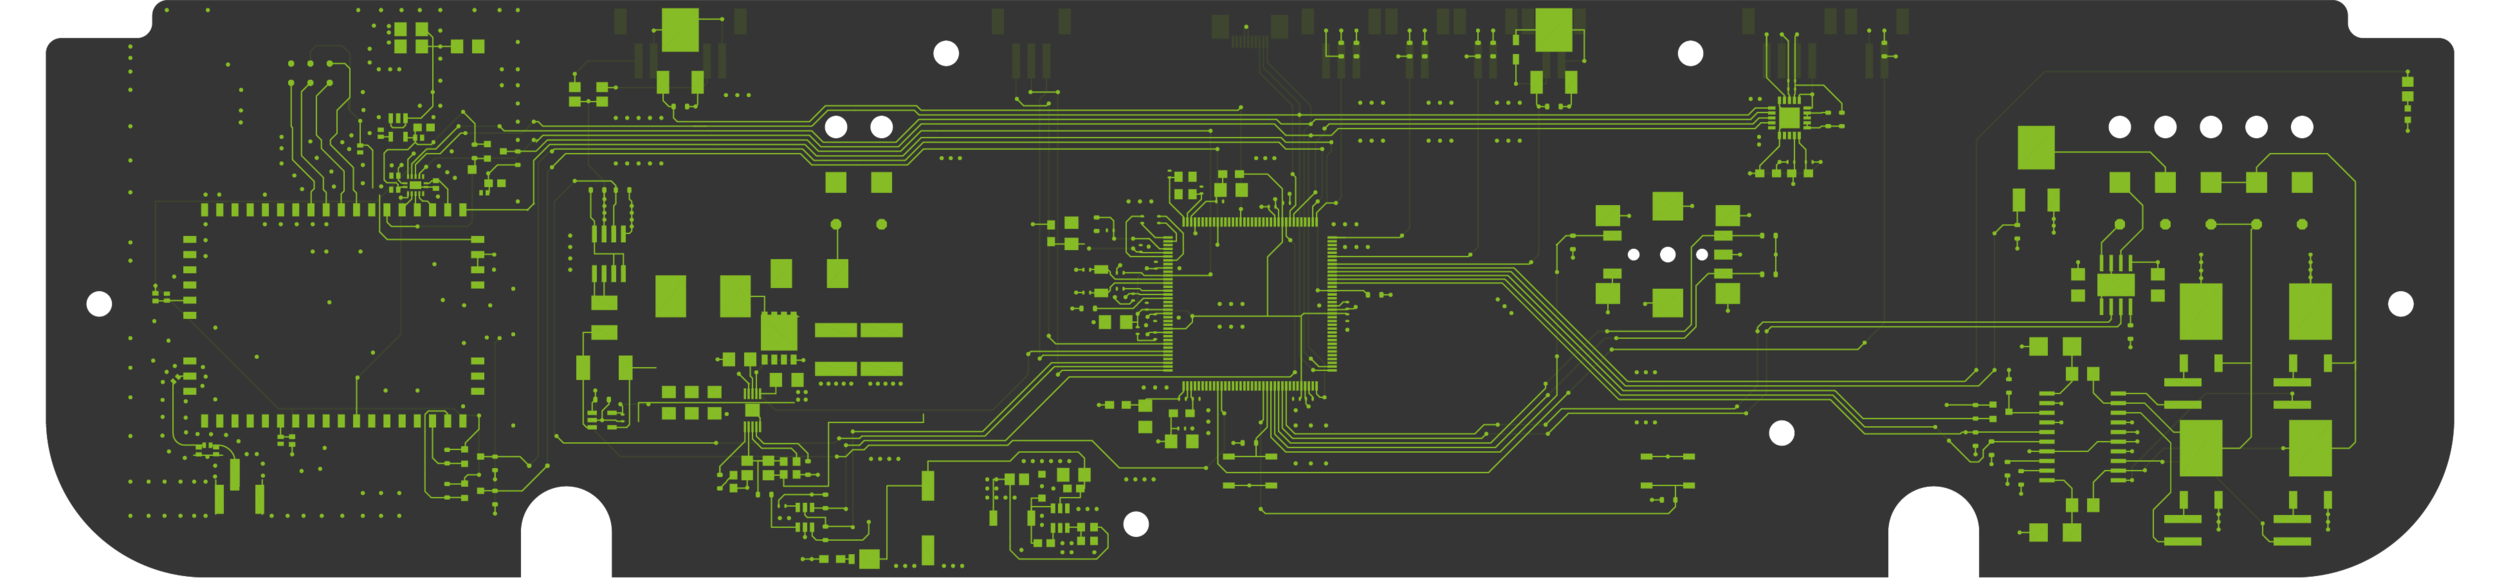 PCBs-04.png